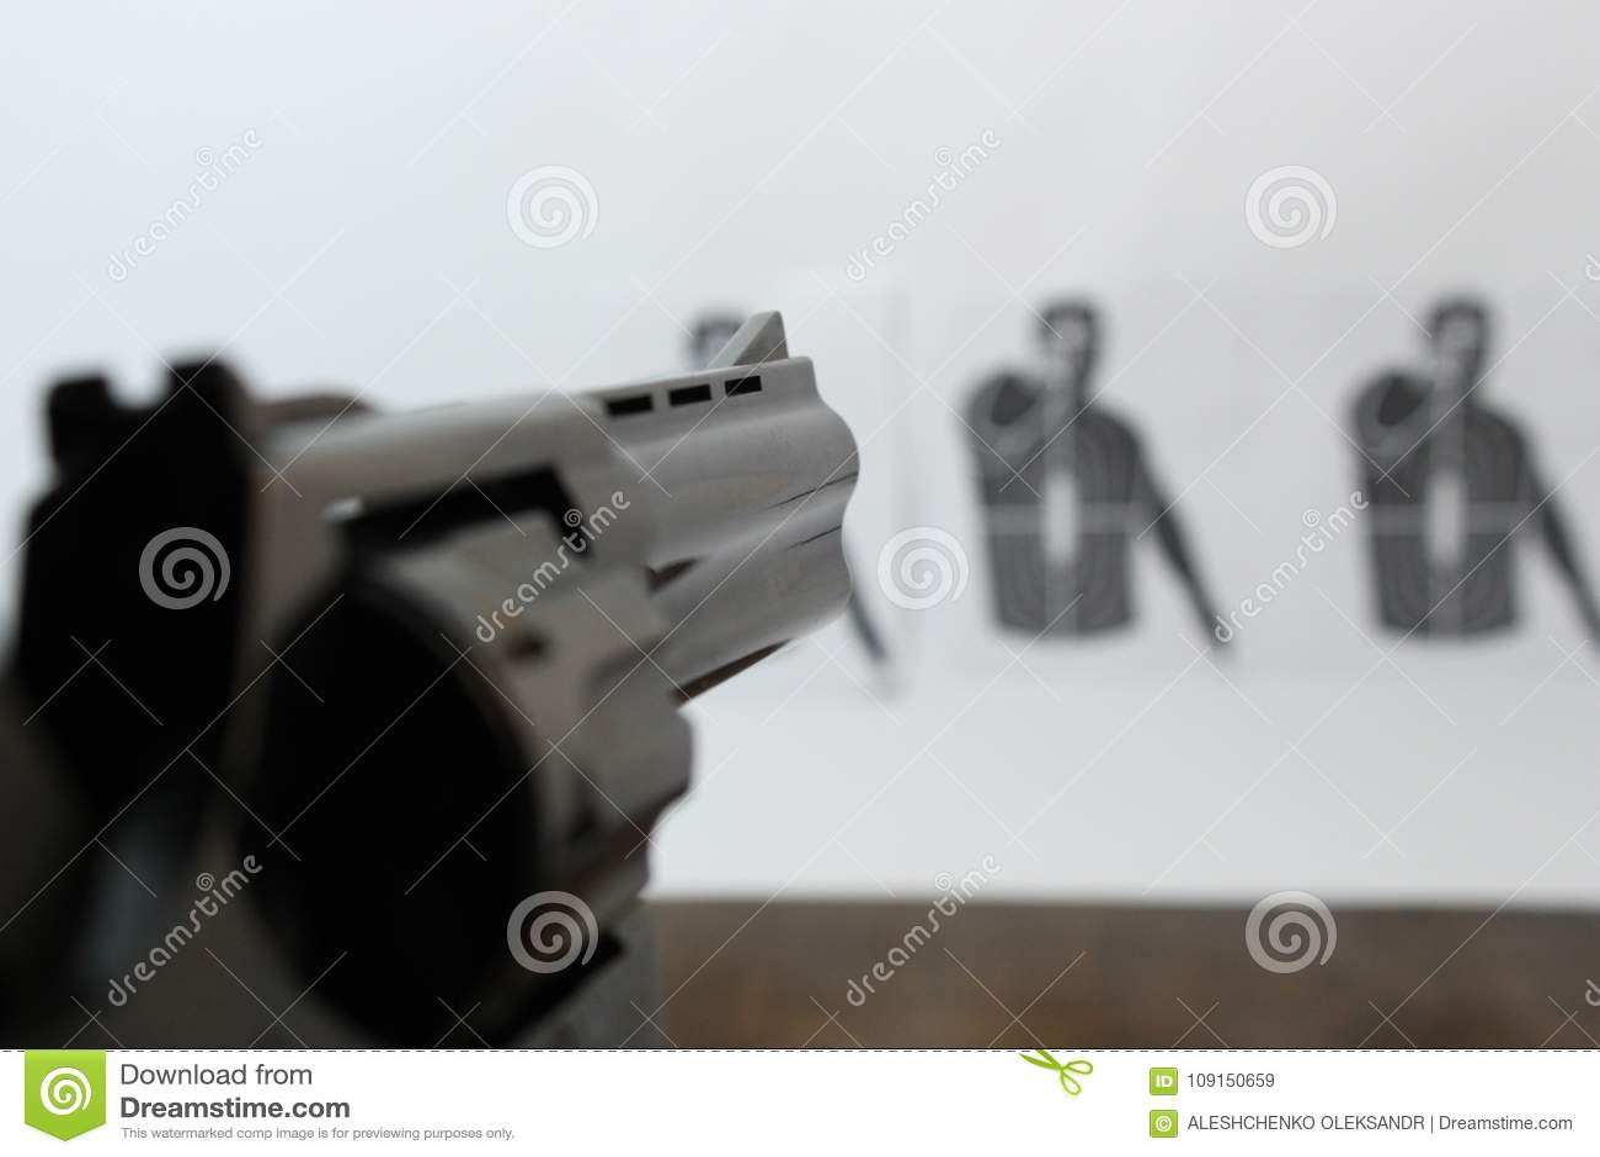 Le revolver est visé la cible de tir